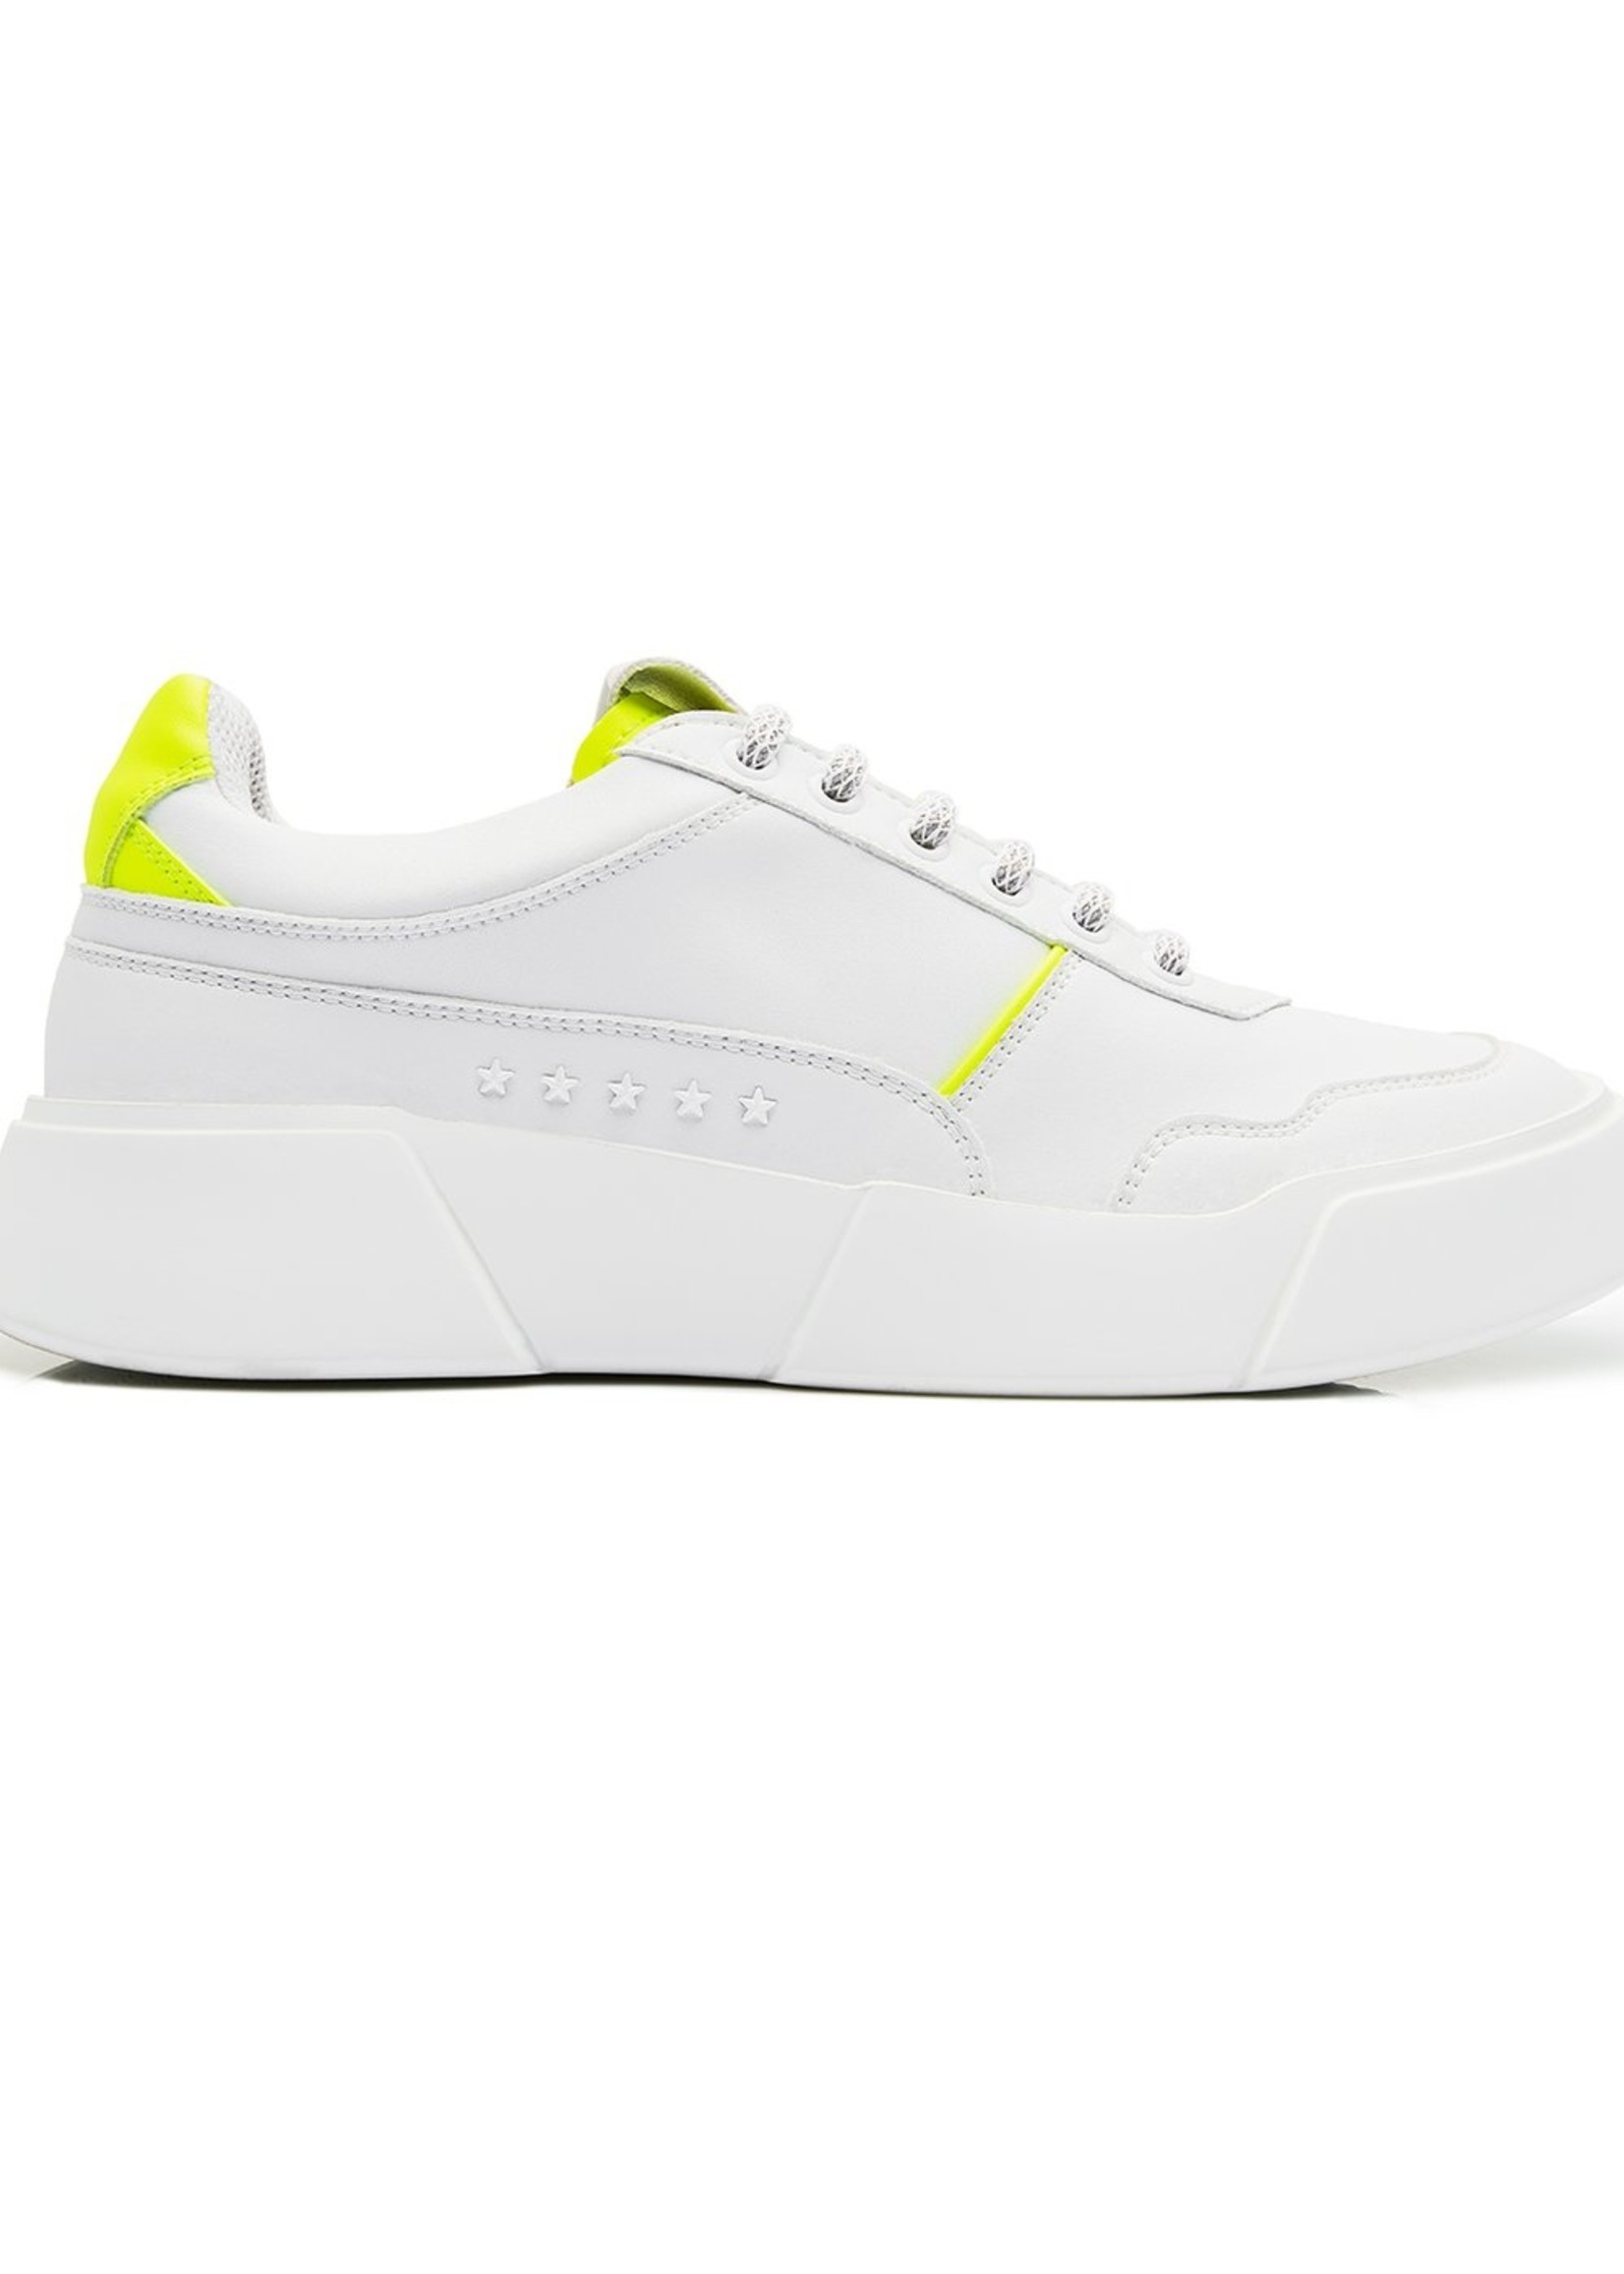 Premium Basics Premium basics sneaker neon fluor